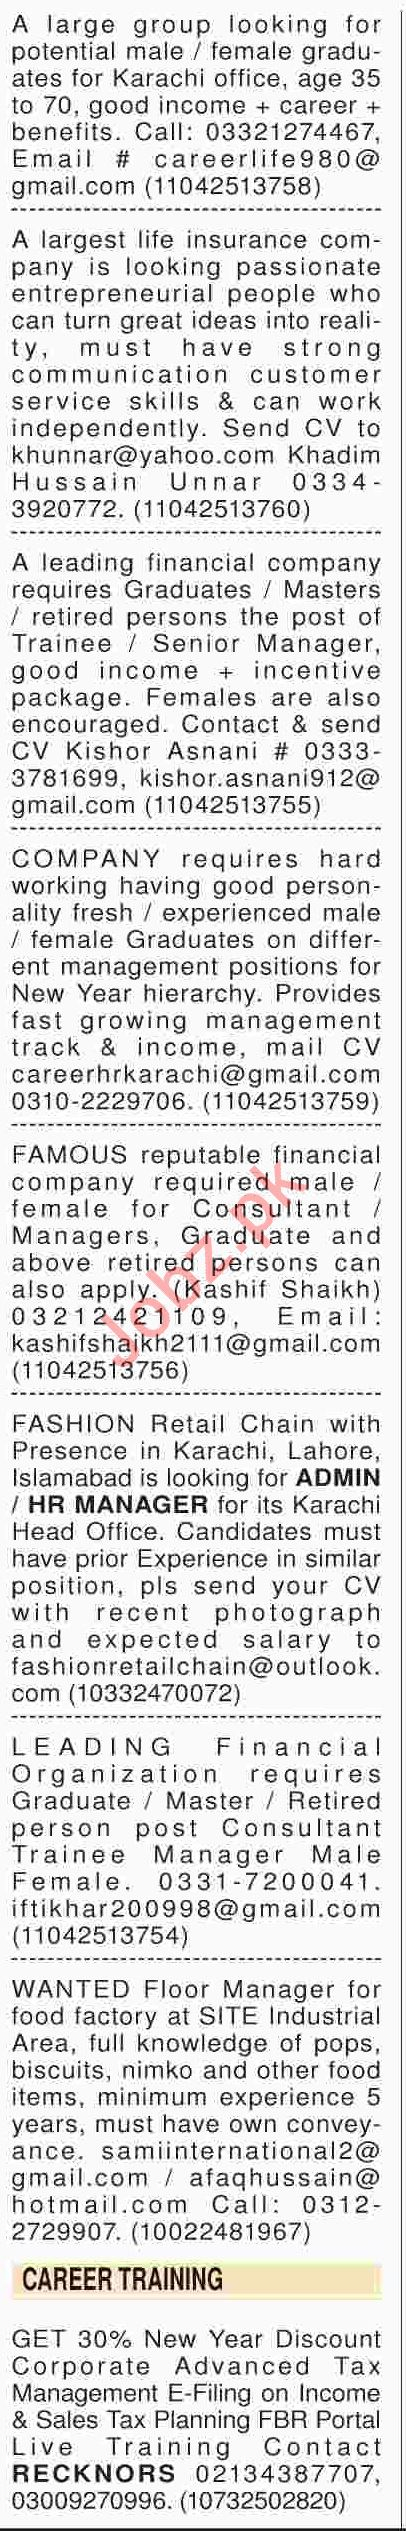 Dawn Sunday Classified Ads 6th Jan 2019 Management Staff